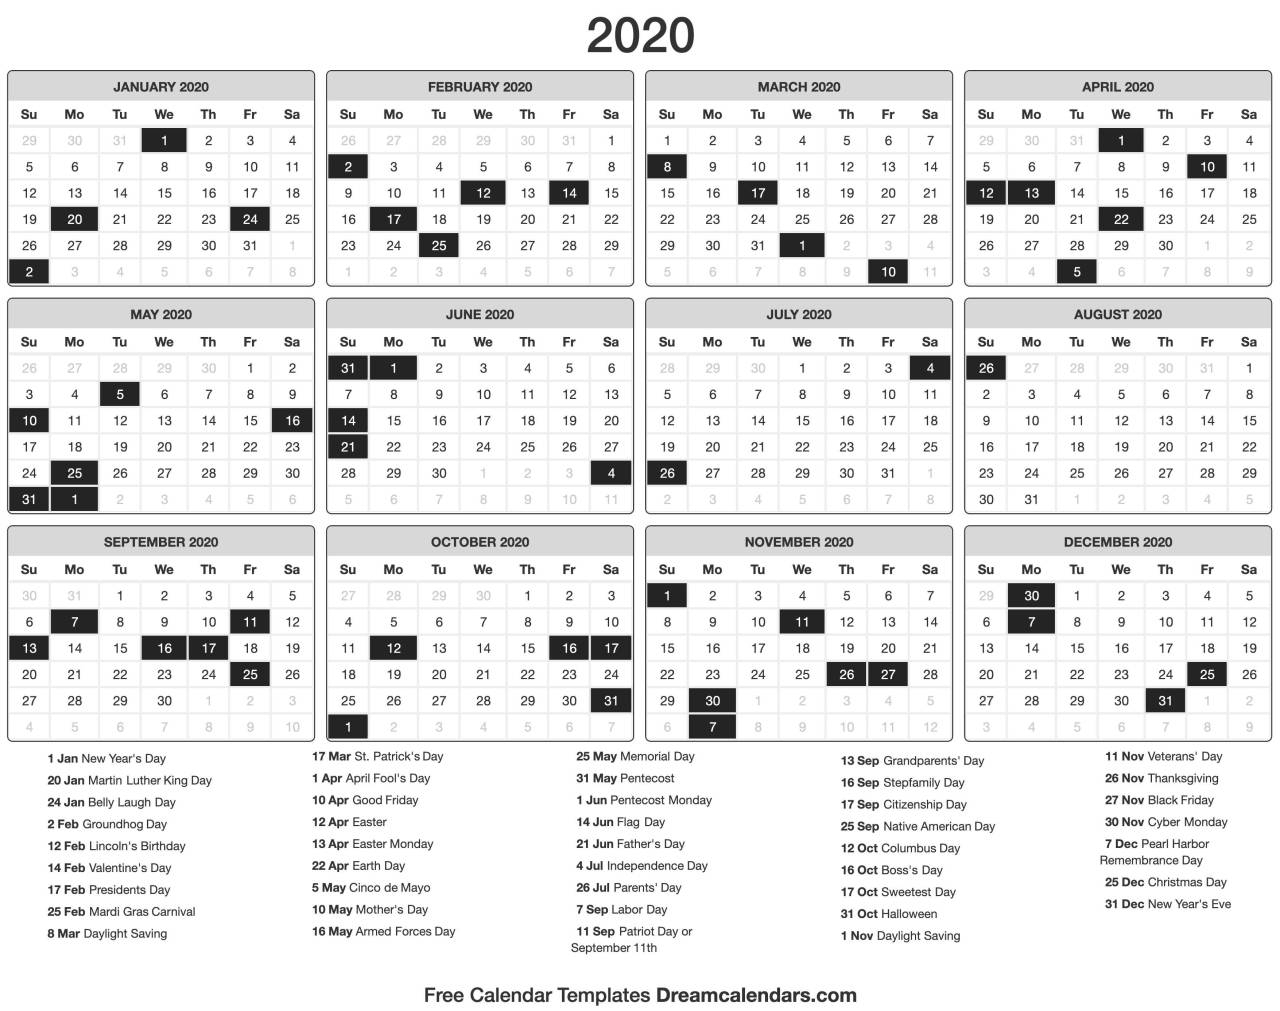 Dream Calendars: Make It 2020 Template — Printable 2020 with 2021 Julian Calendar